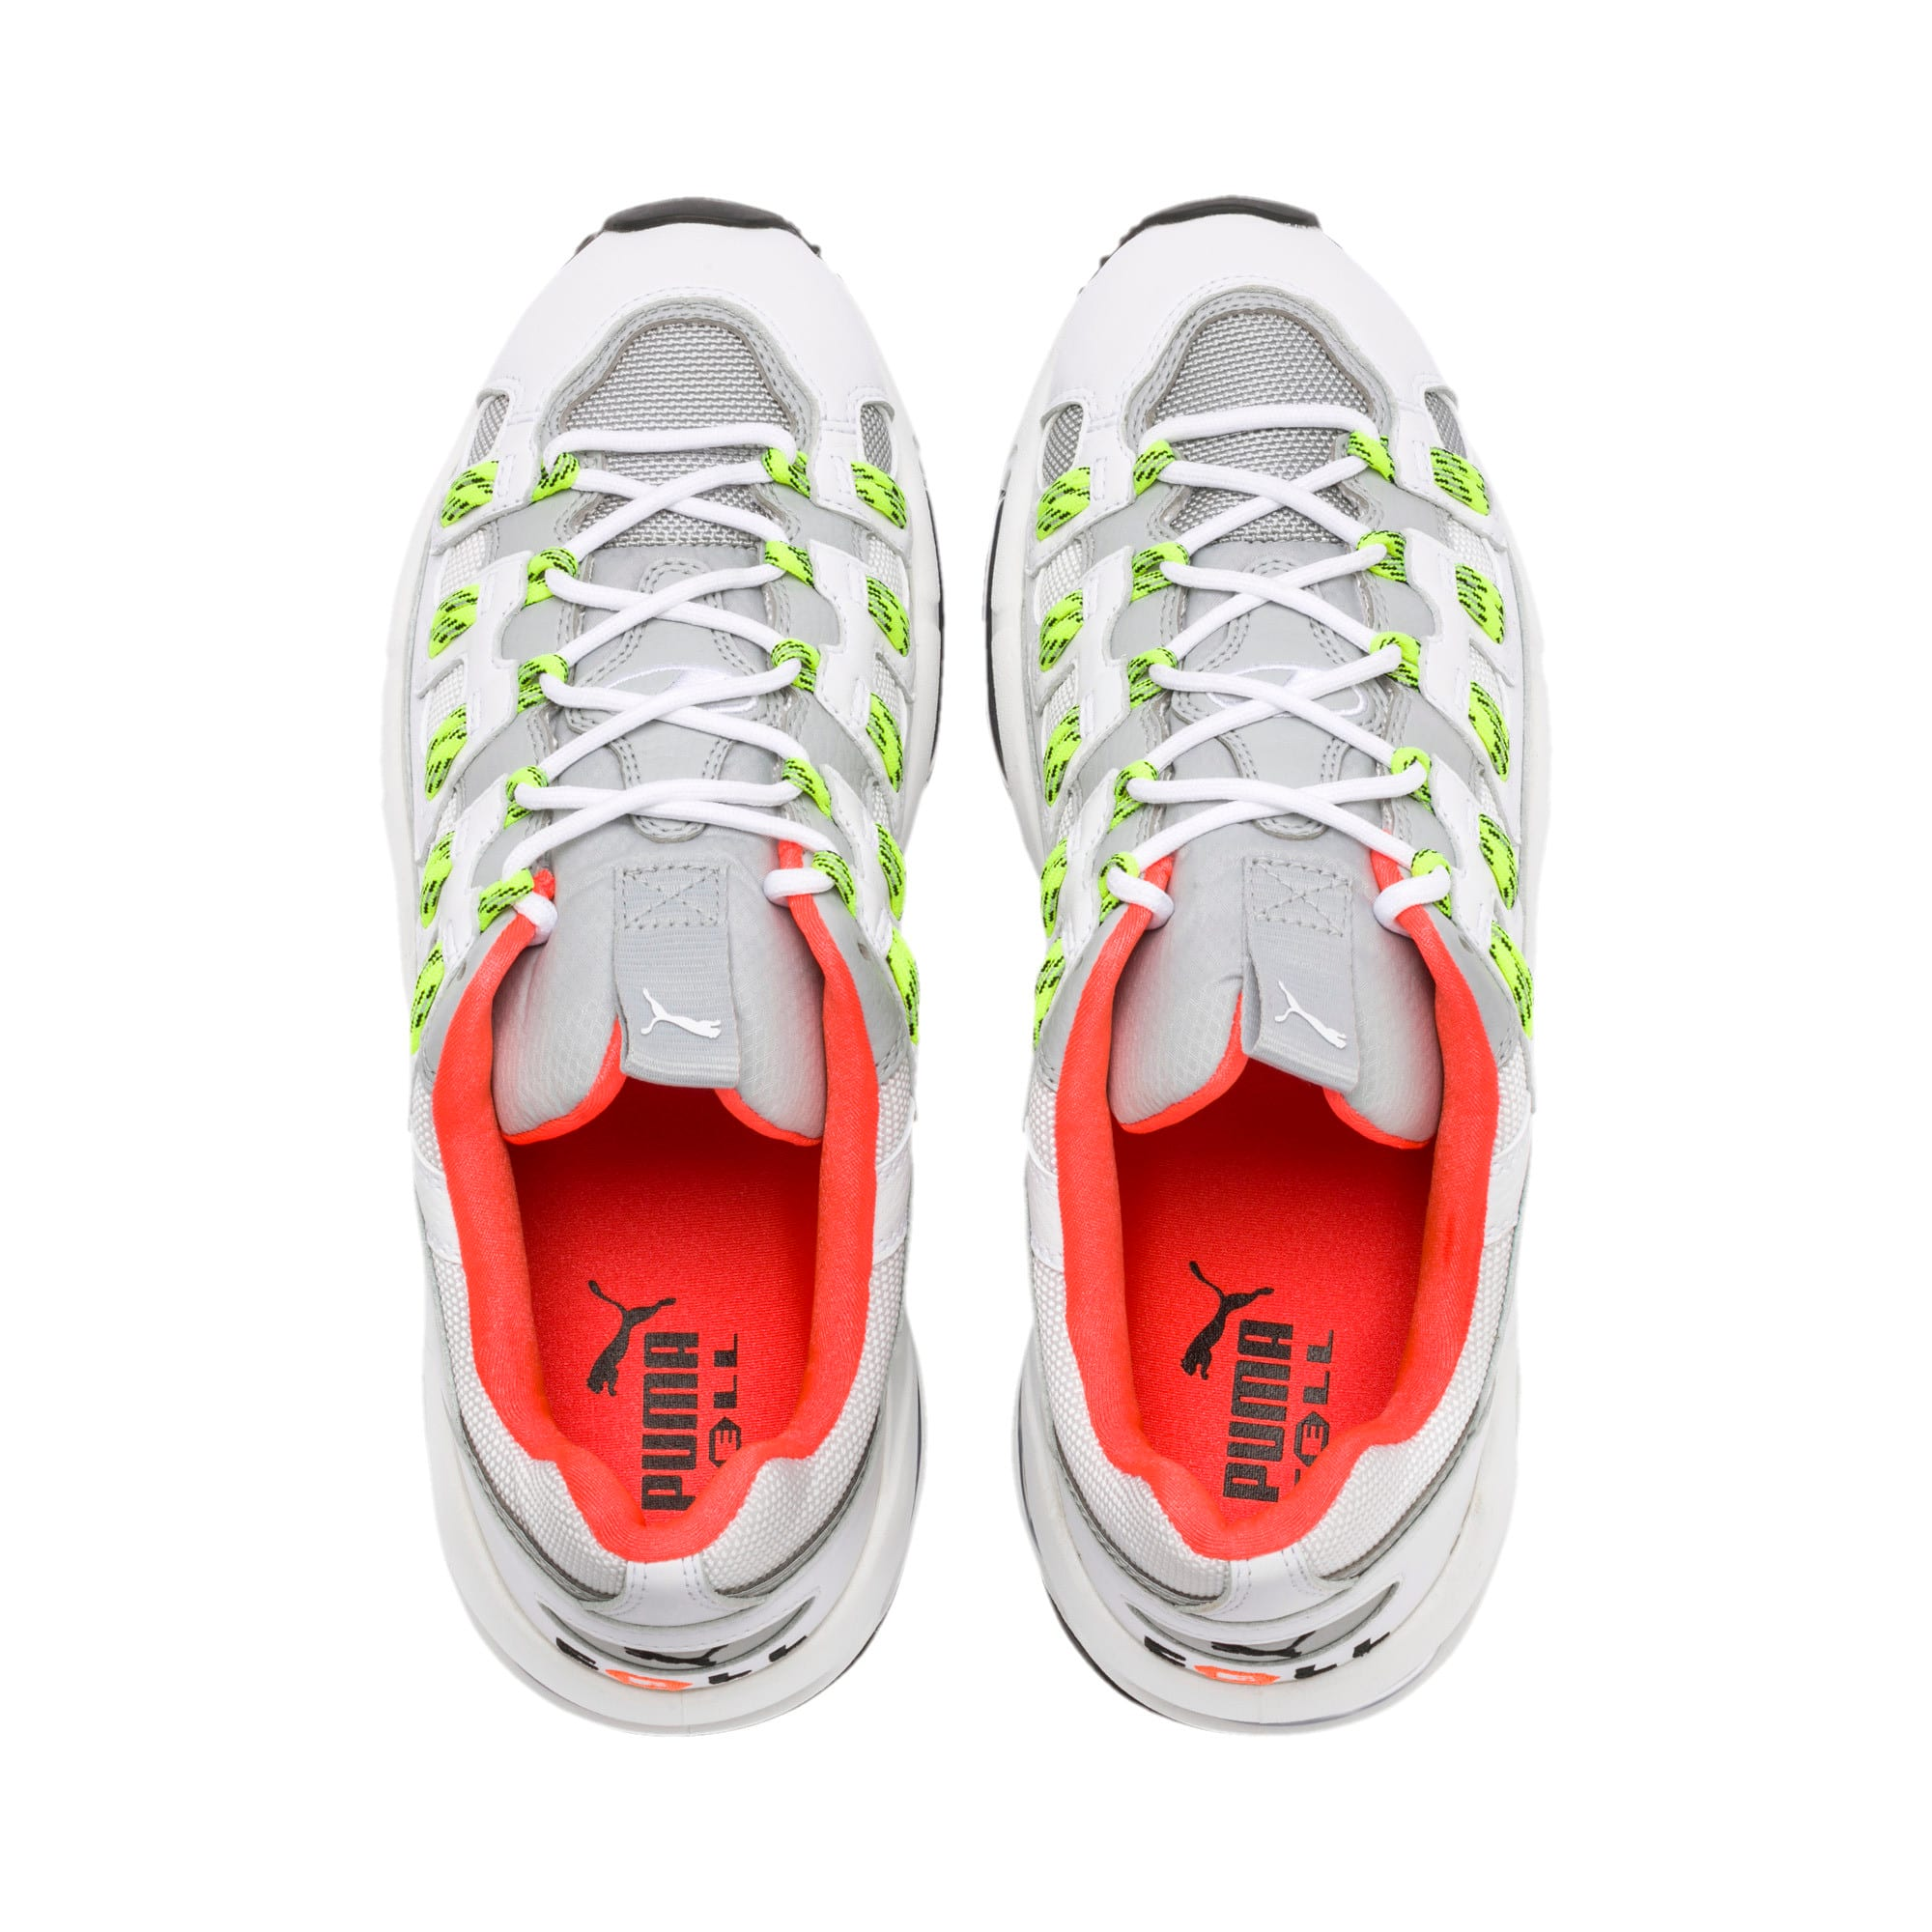 Thumbnail 7 of CELL Endura Rebound Sneakers, Puma White-High Rise, medium